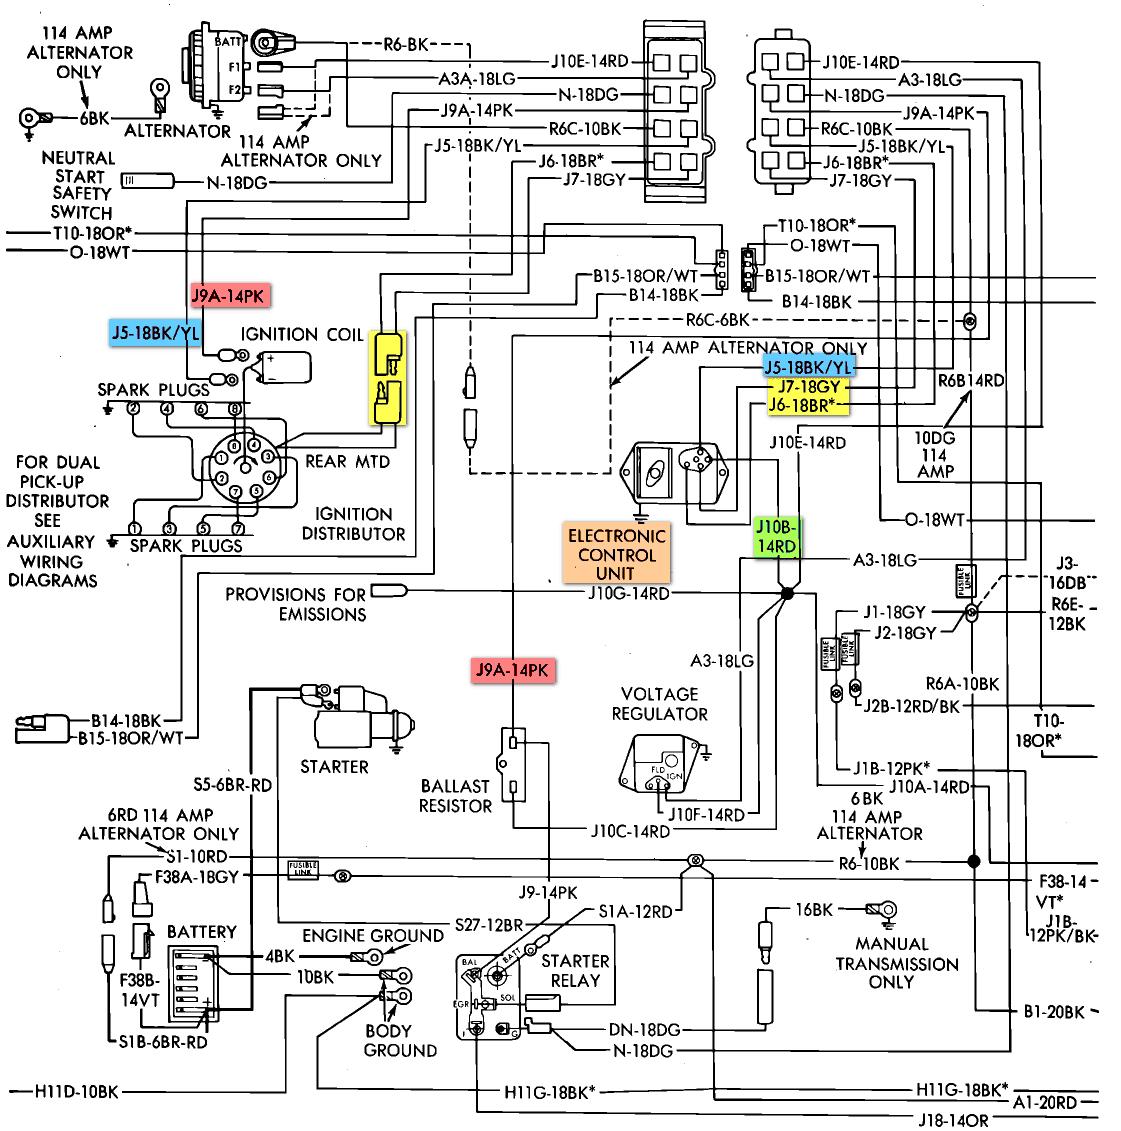 Diagram 2002 Pace Arrow Wiring Diagram Full Version Hd Quality Wiring Diagram Diagrameavesl Candyarena It